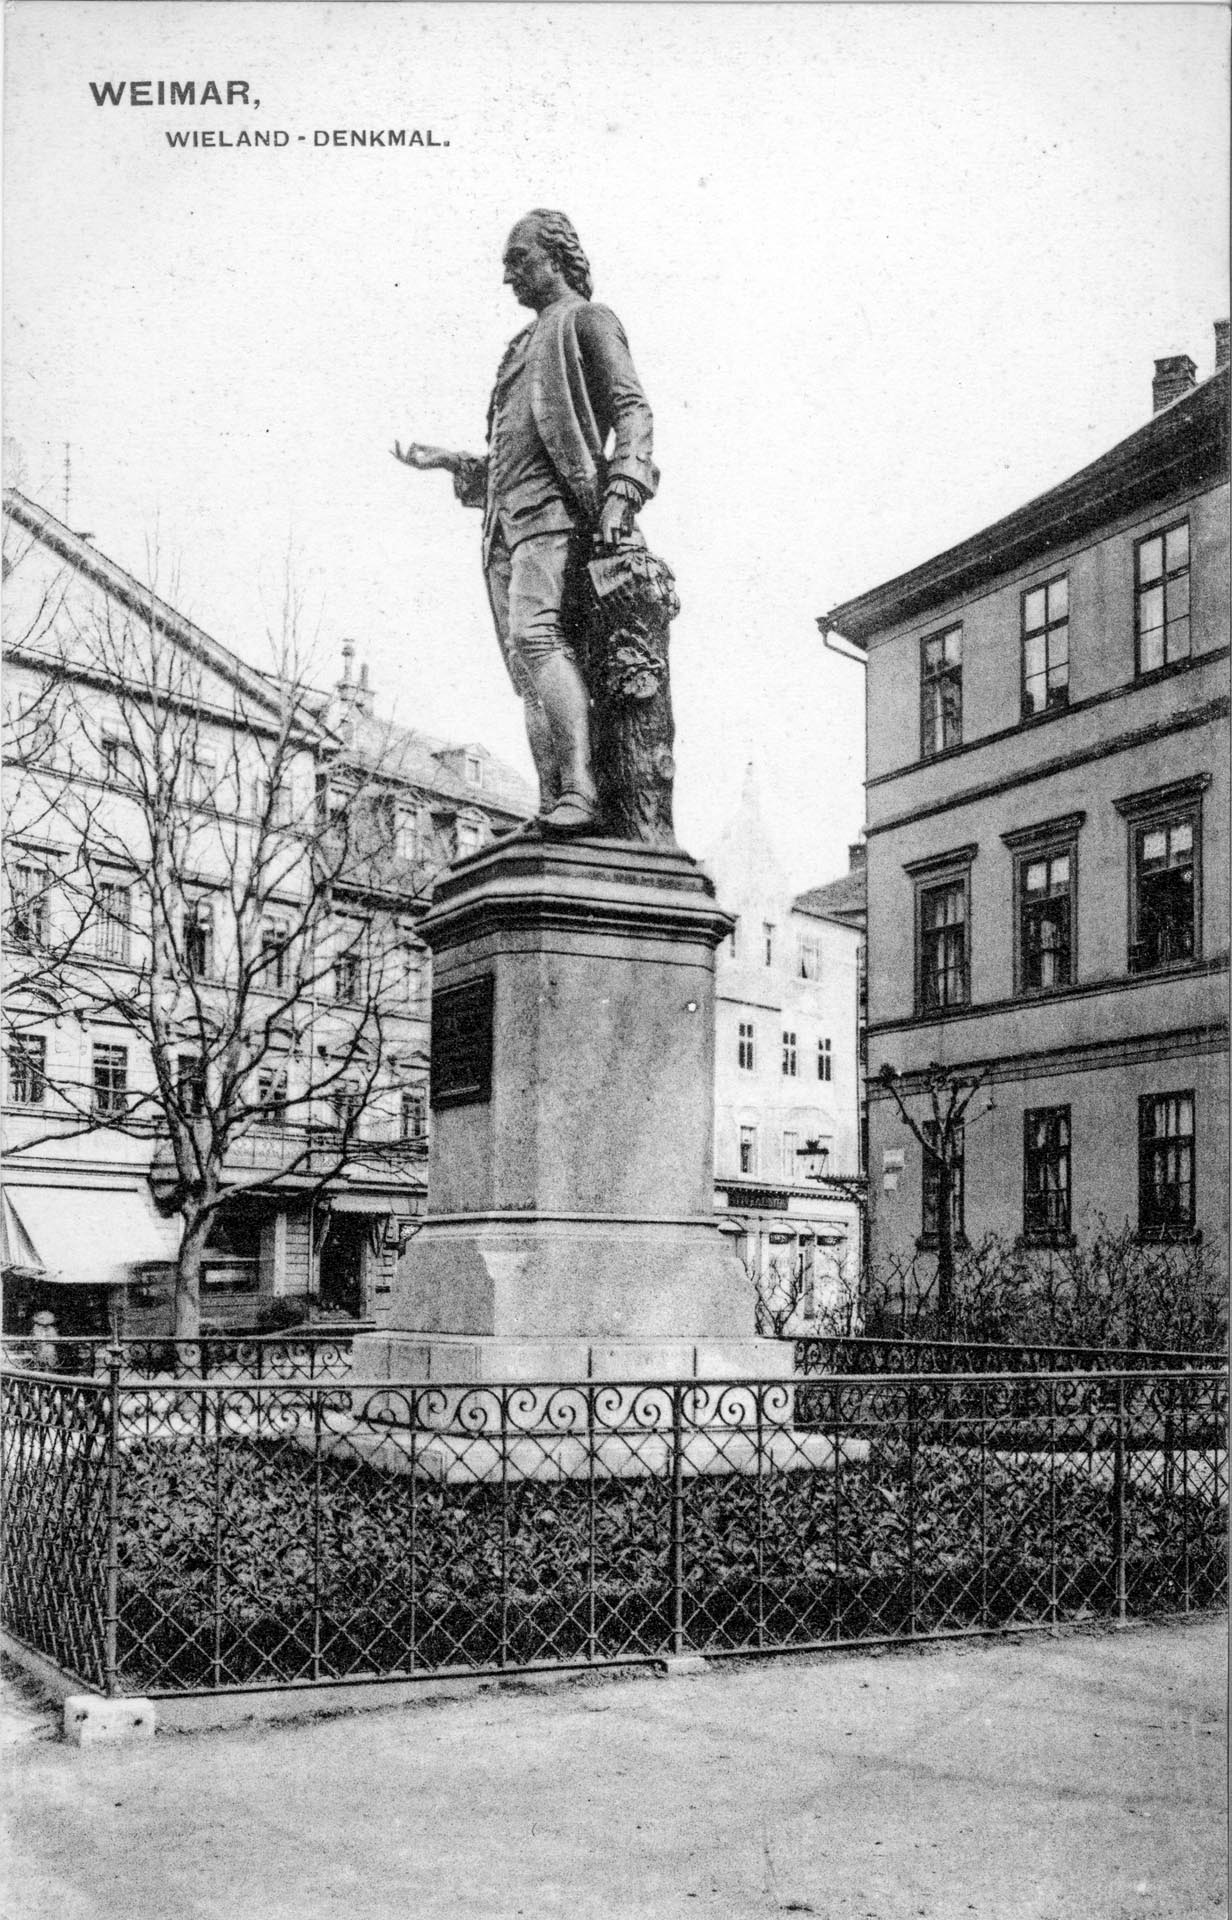 Wieland - Denkmal